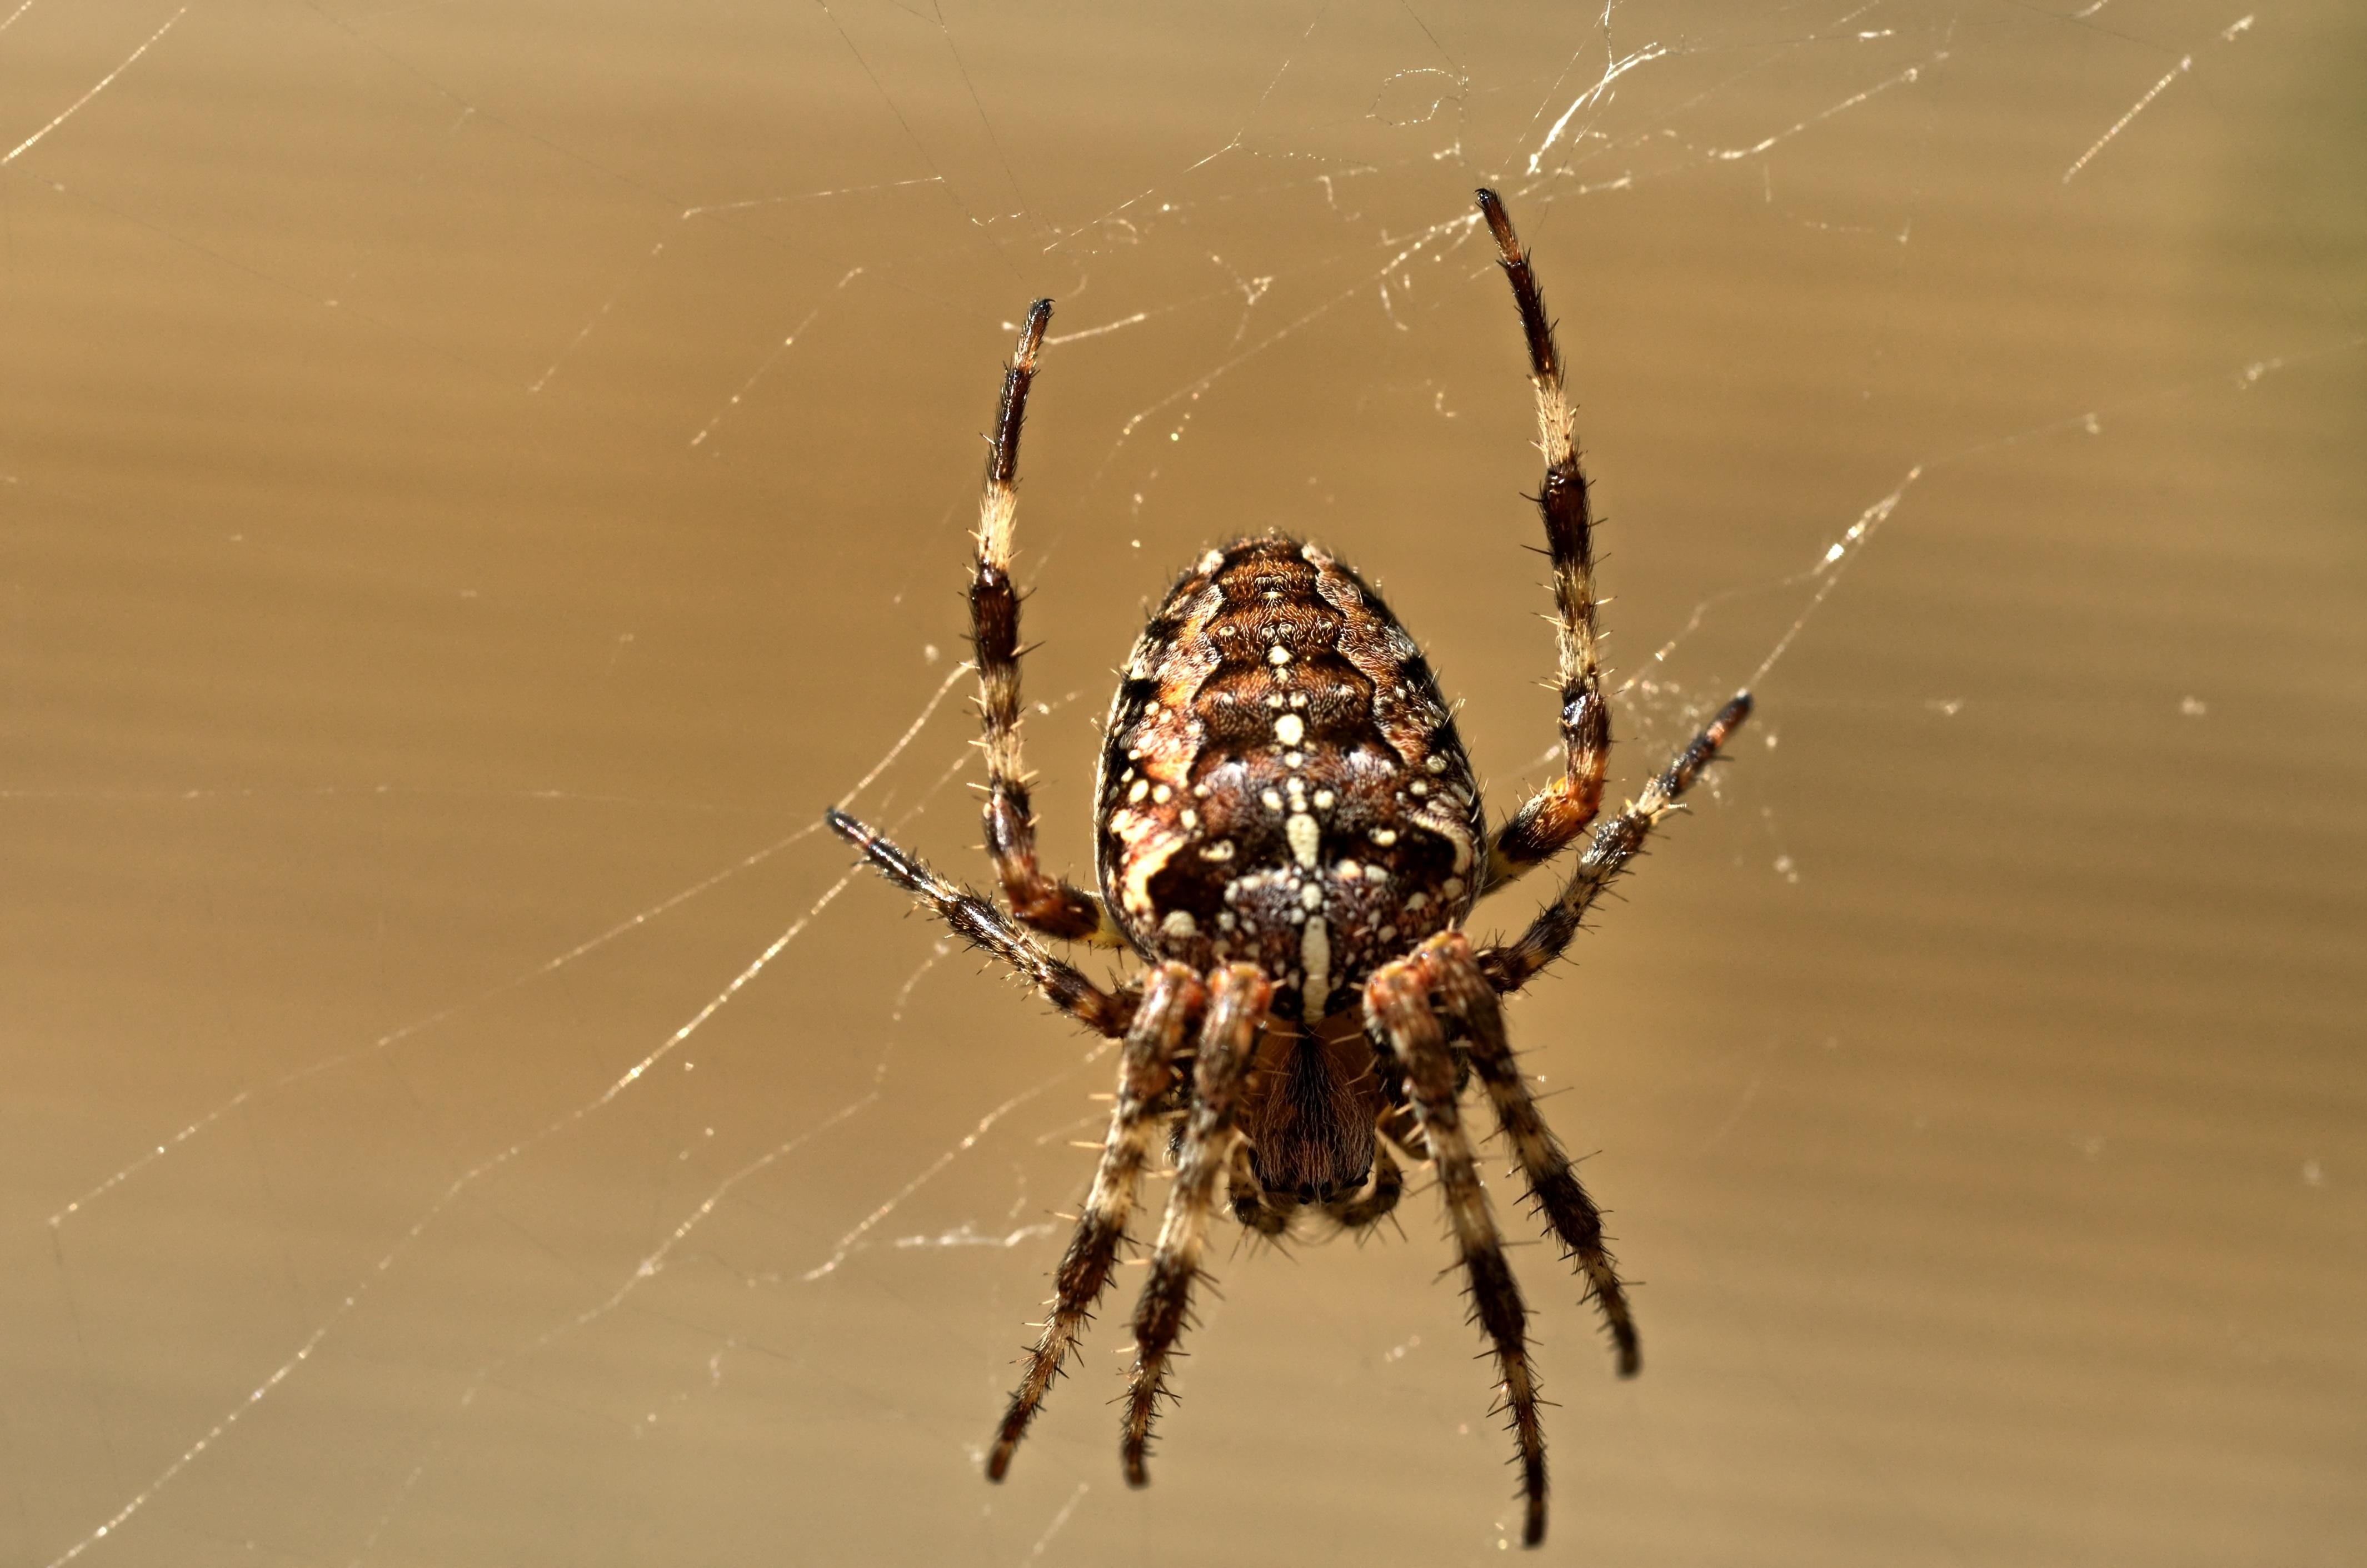 Free Images : nature, insect, fauna, invertebrate, cobweb, close up ...